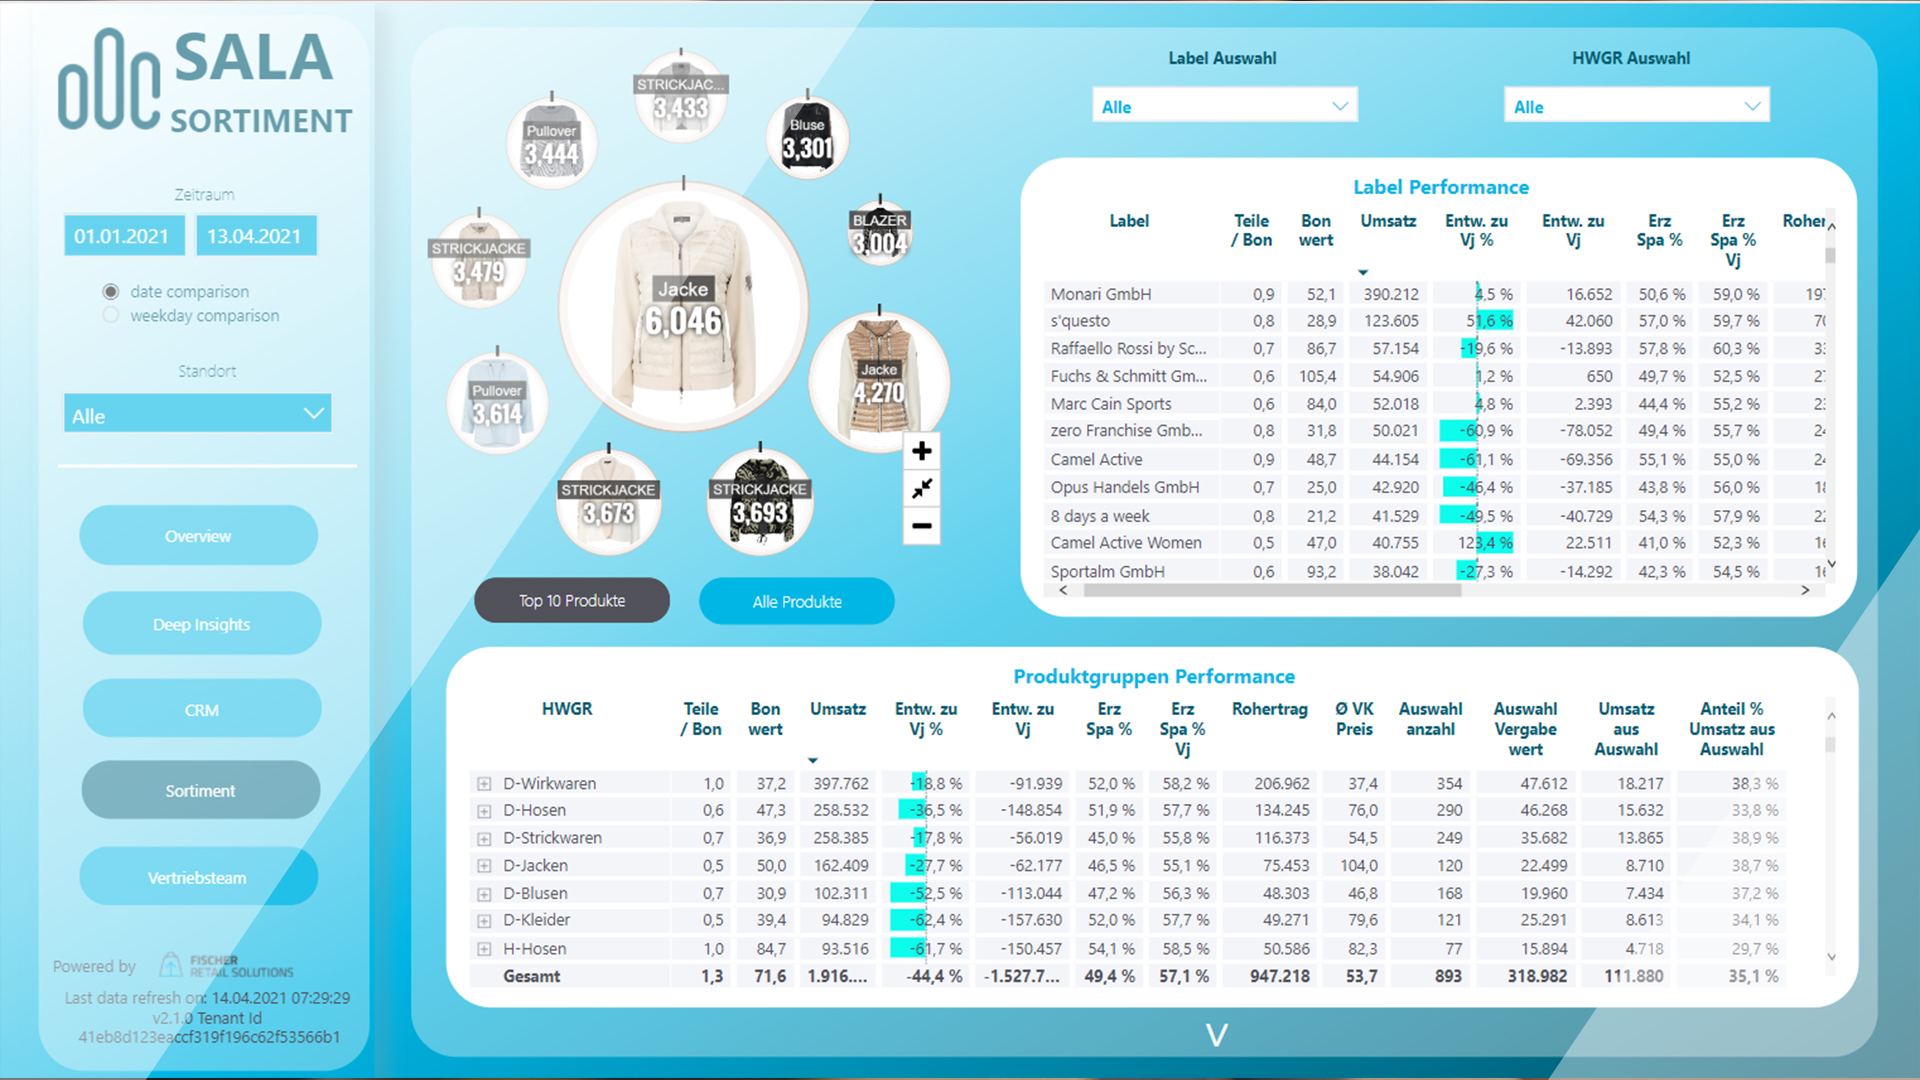 Sales Department Analysis – SALA